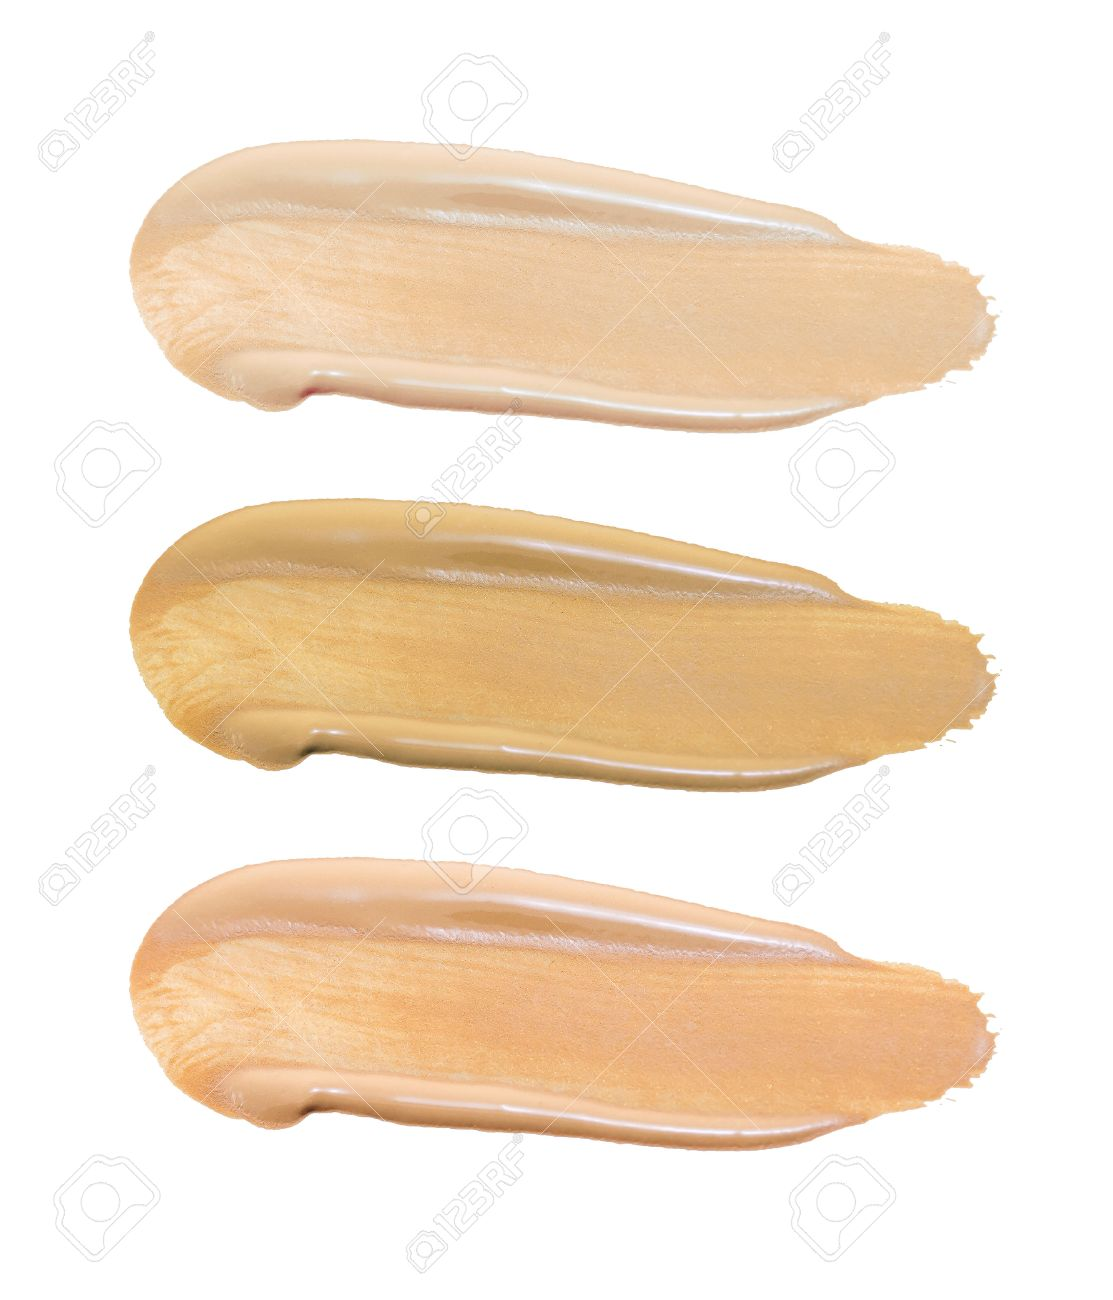 Set of foundation swatches isolated on white background - 41758145